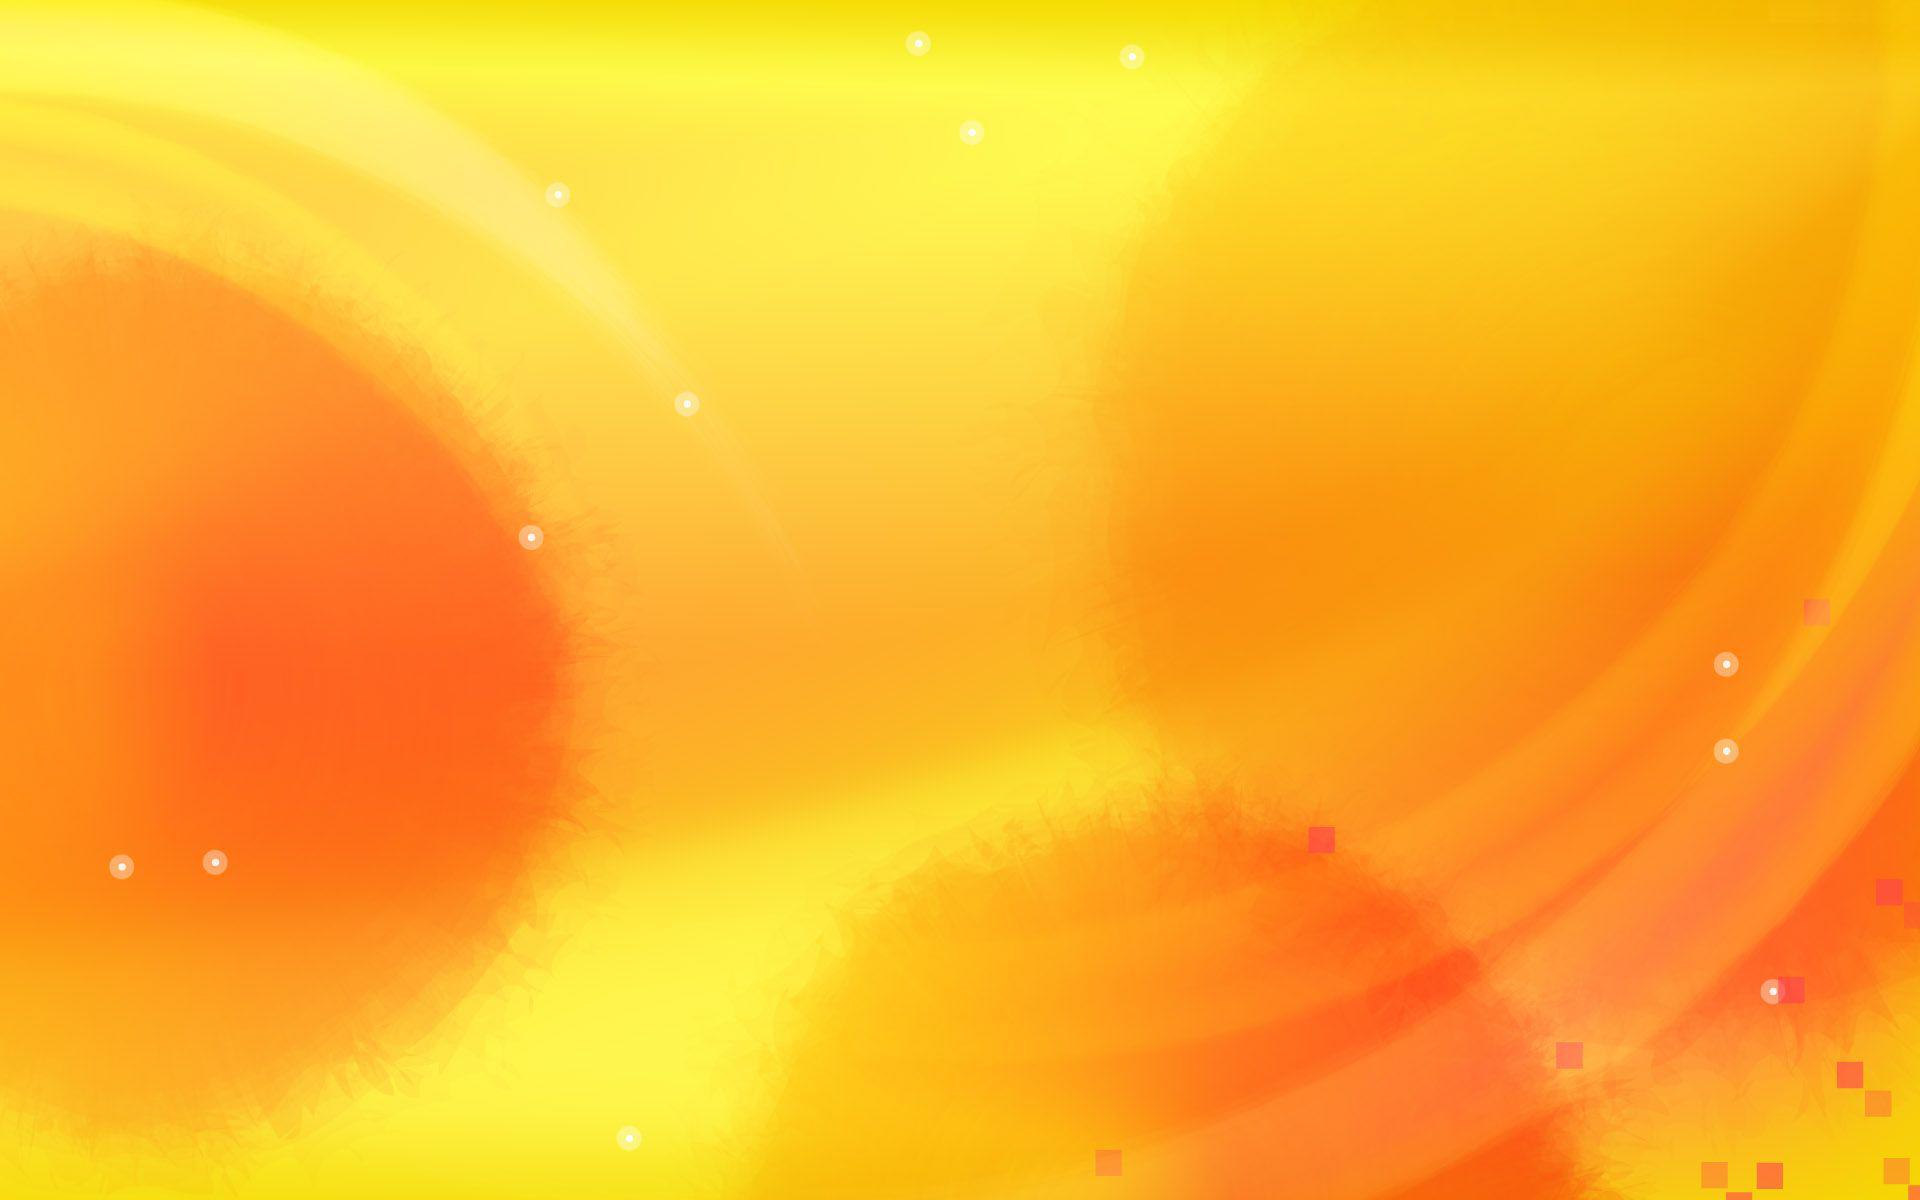 Orange-background-design-7